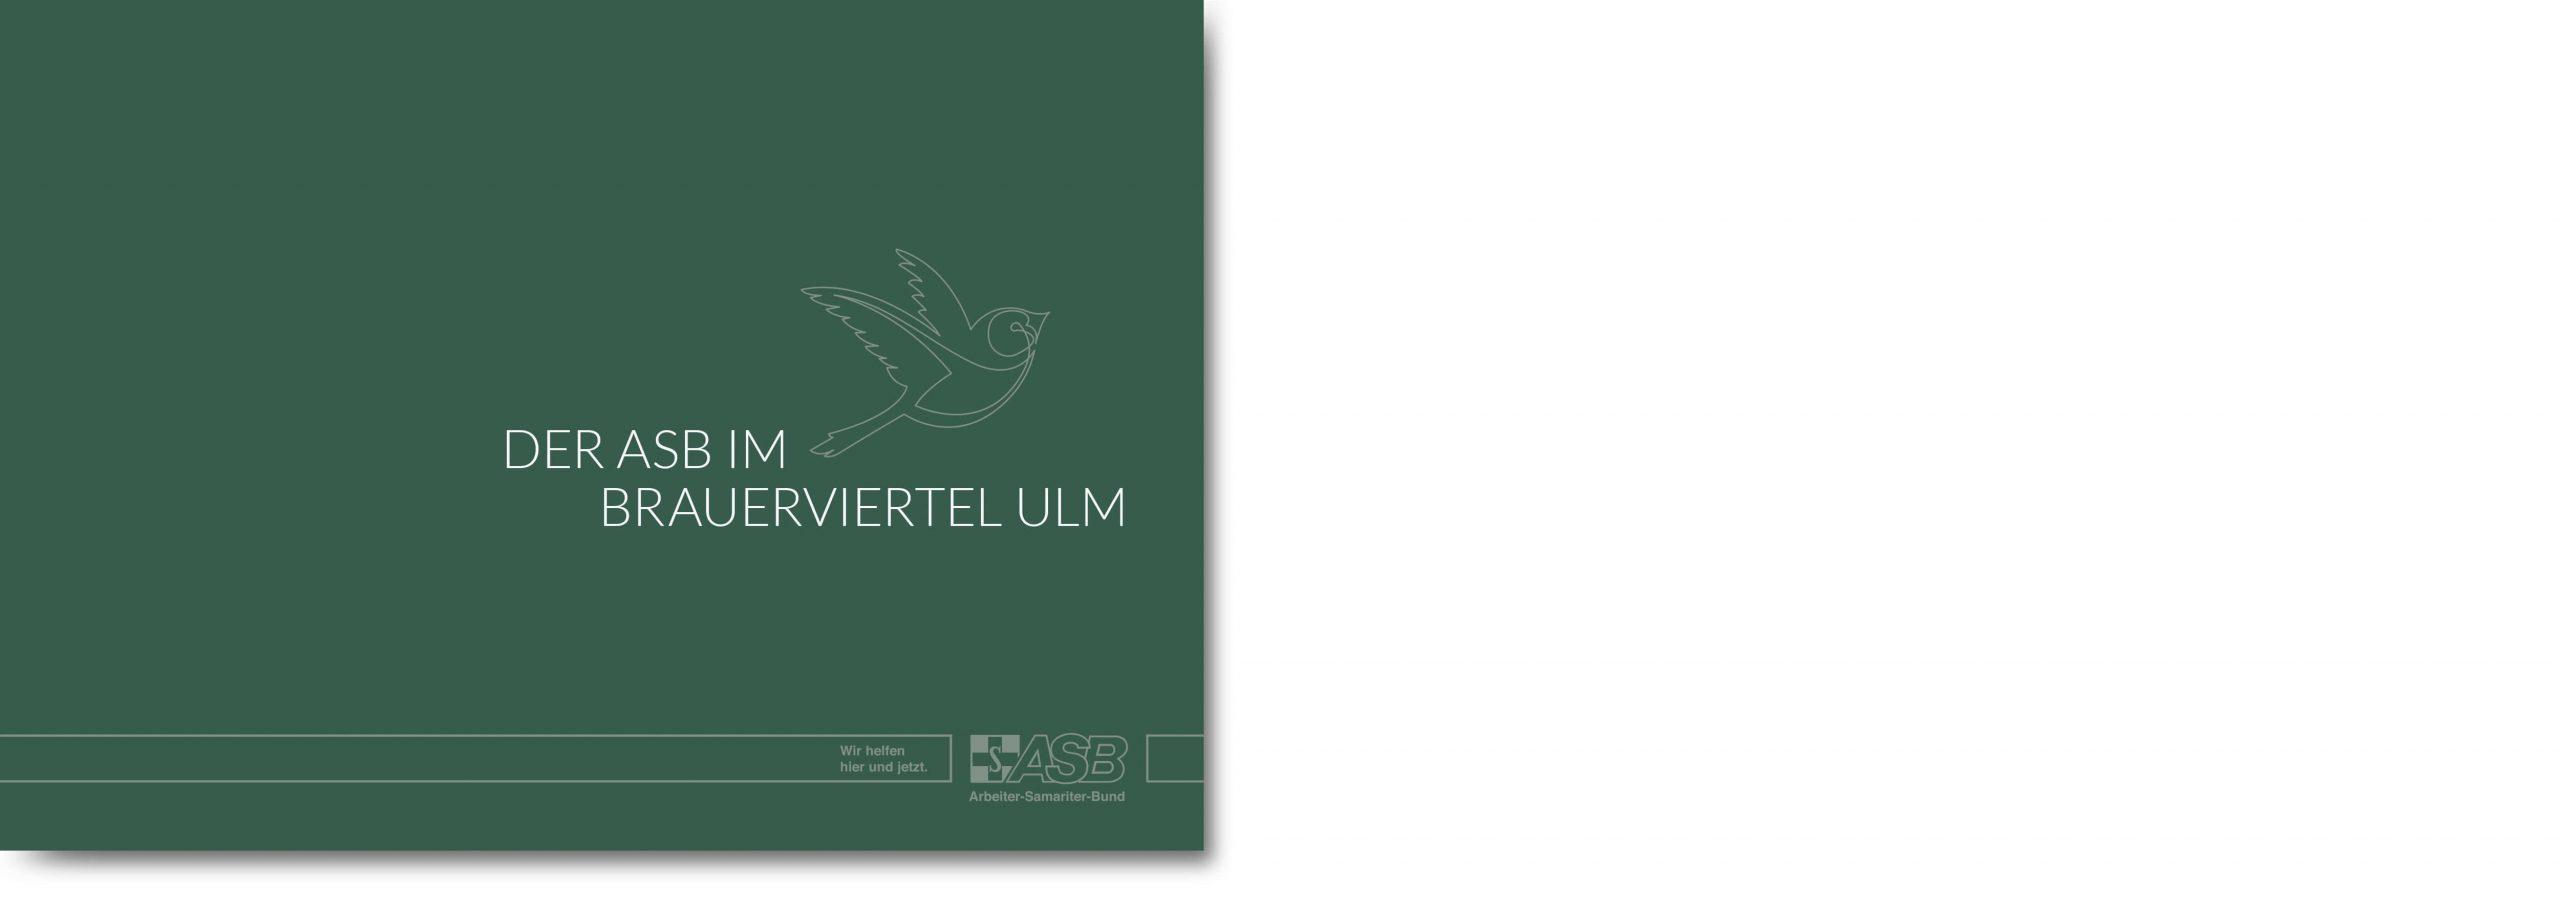 fh-web-asb-broschüren-Ulm-titel-1-scaled.jpg